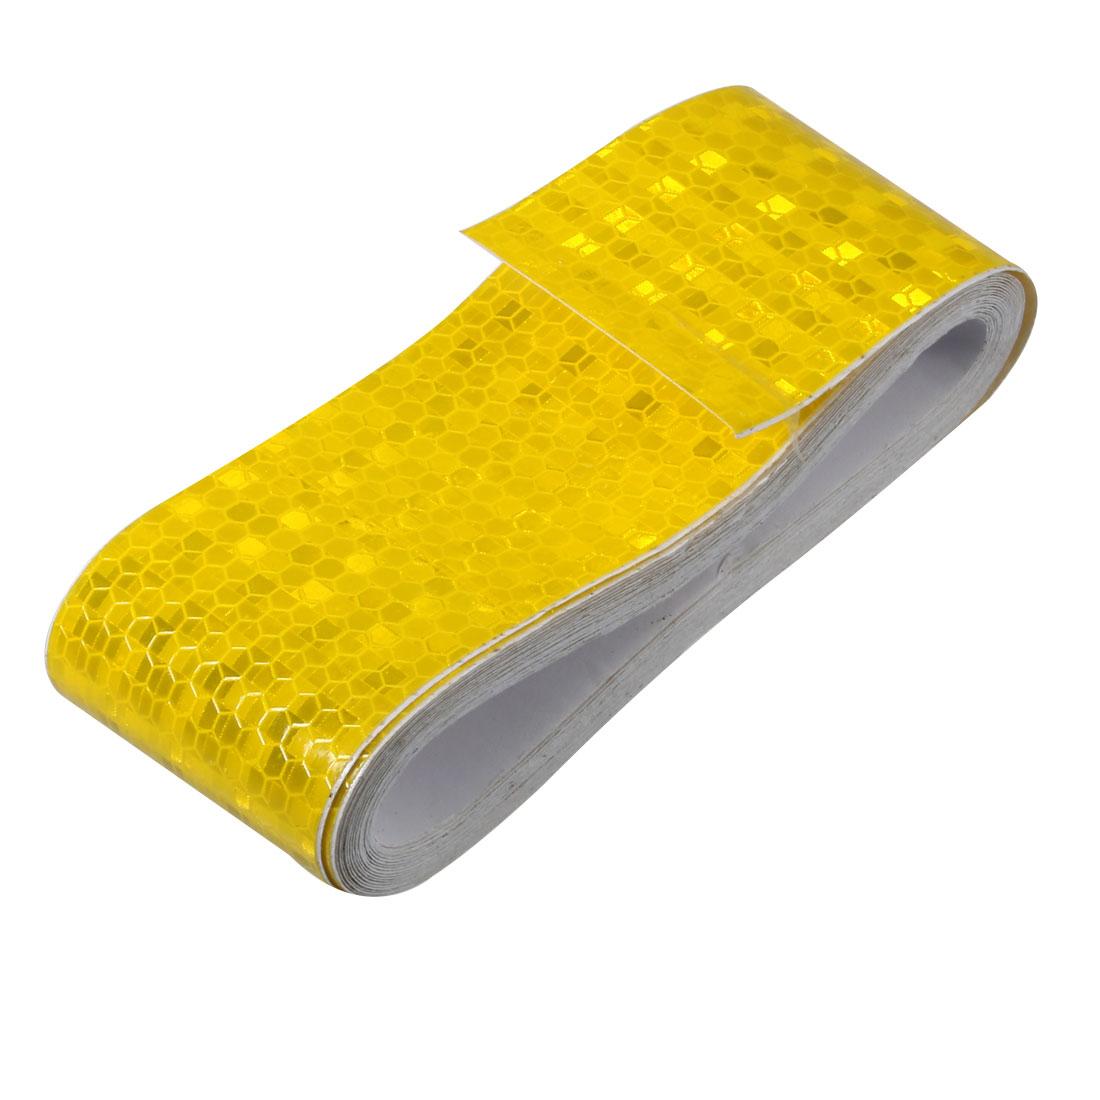 Honeycomb Reflective Warning Tape Film Sticker Yellow 50mm Width 5m Length